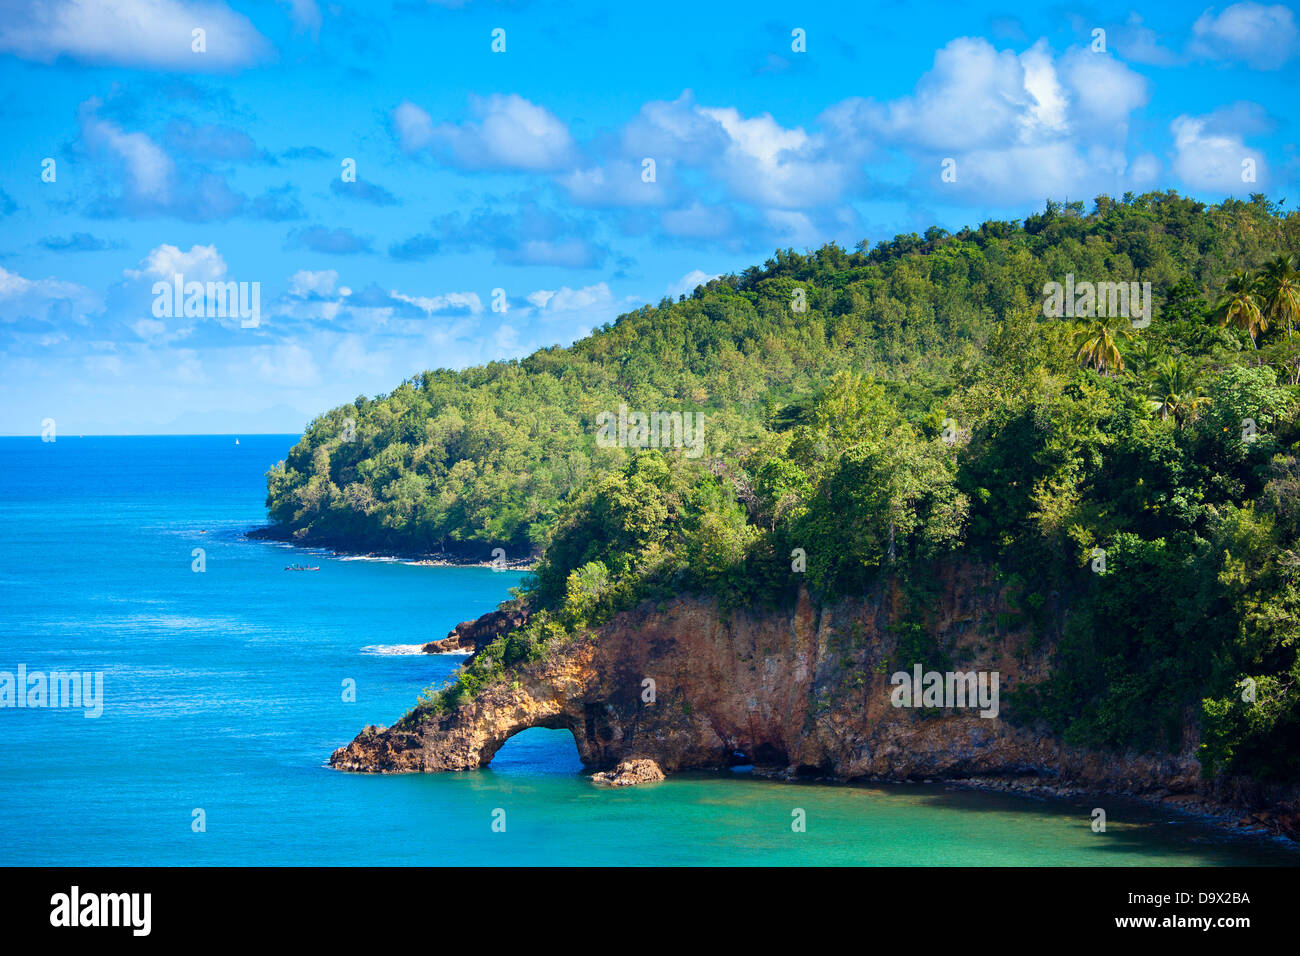 land bridge on the caribbean, st lucia - Stock Image